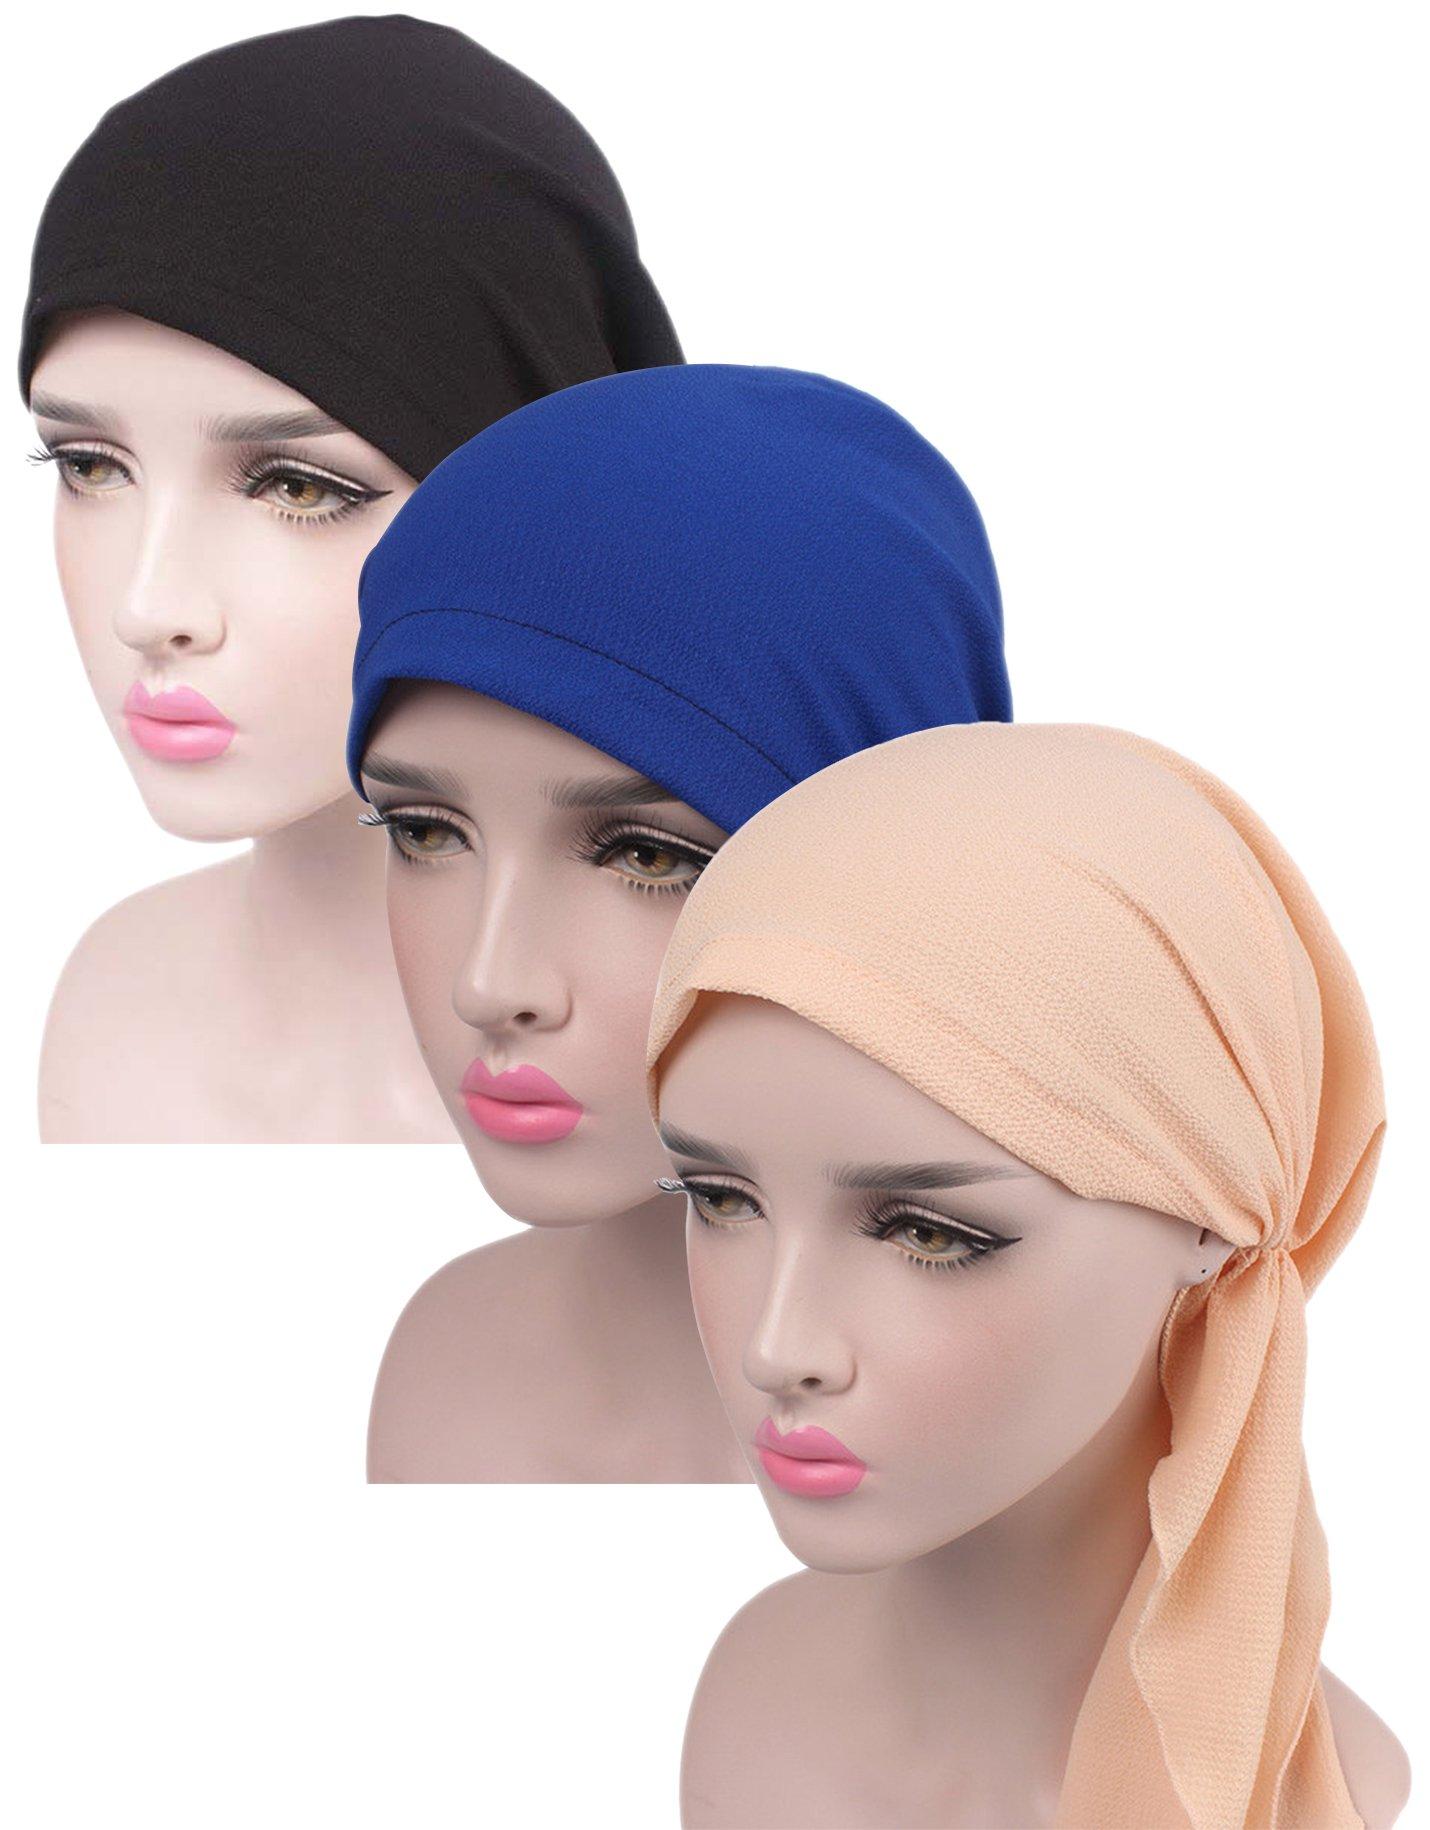 TFB.Love Chemo Hat Turban Head Scarves Pre-Tied Headwear (zuhe52)